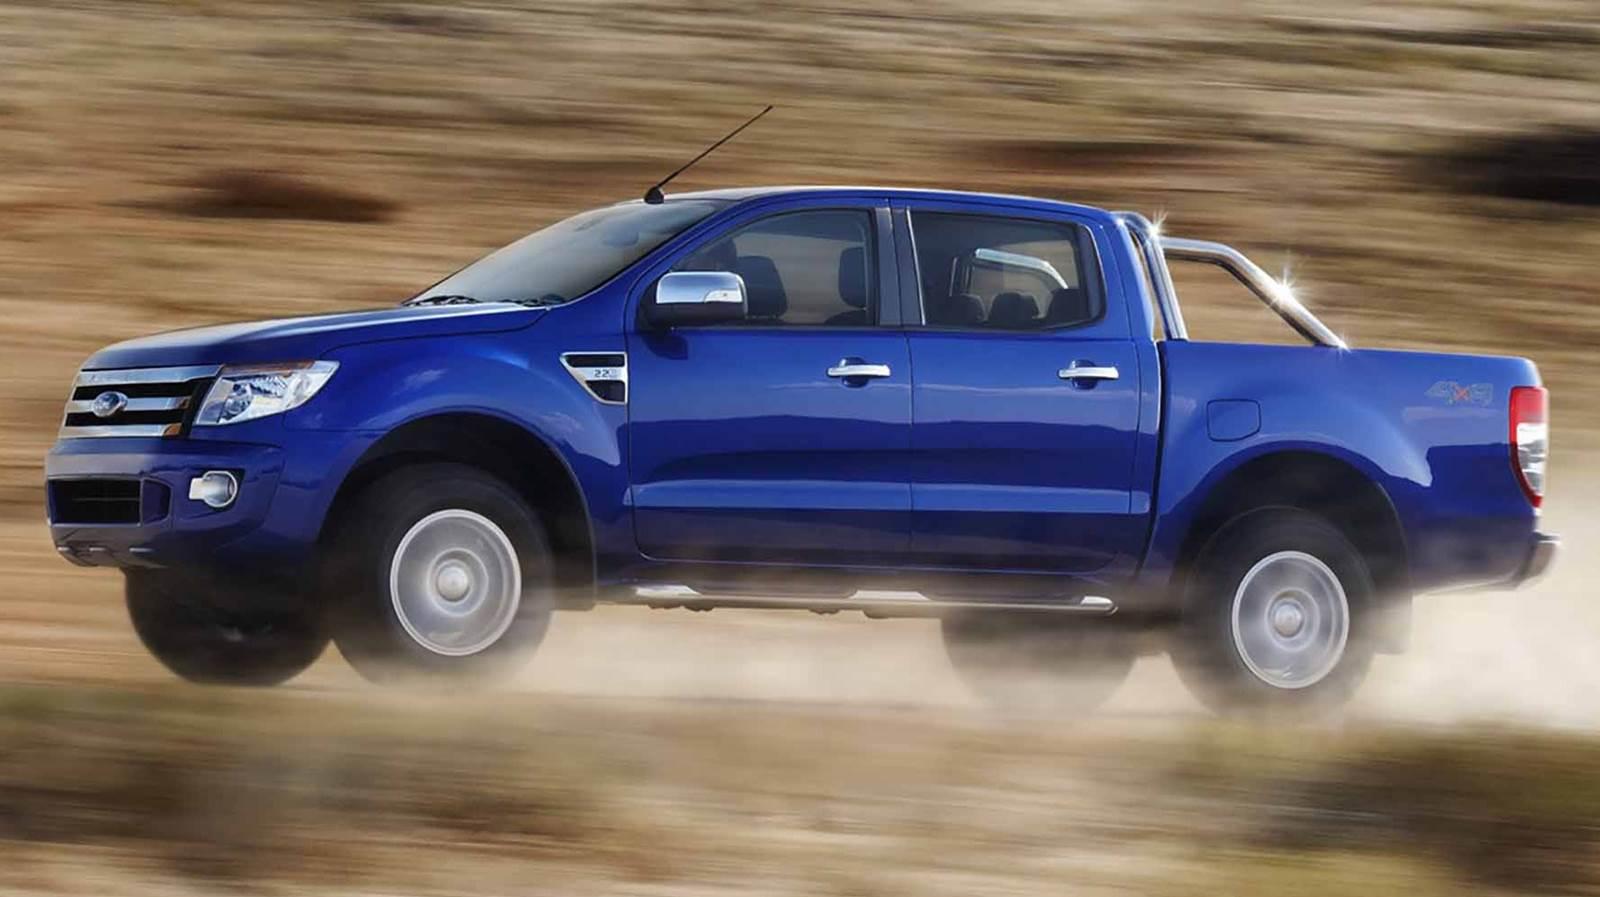 Ford Ranger XLS 2.2 Diesel 2013 2014 - recall